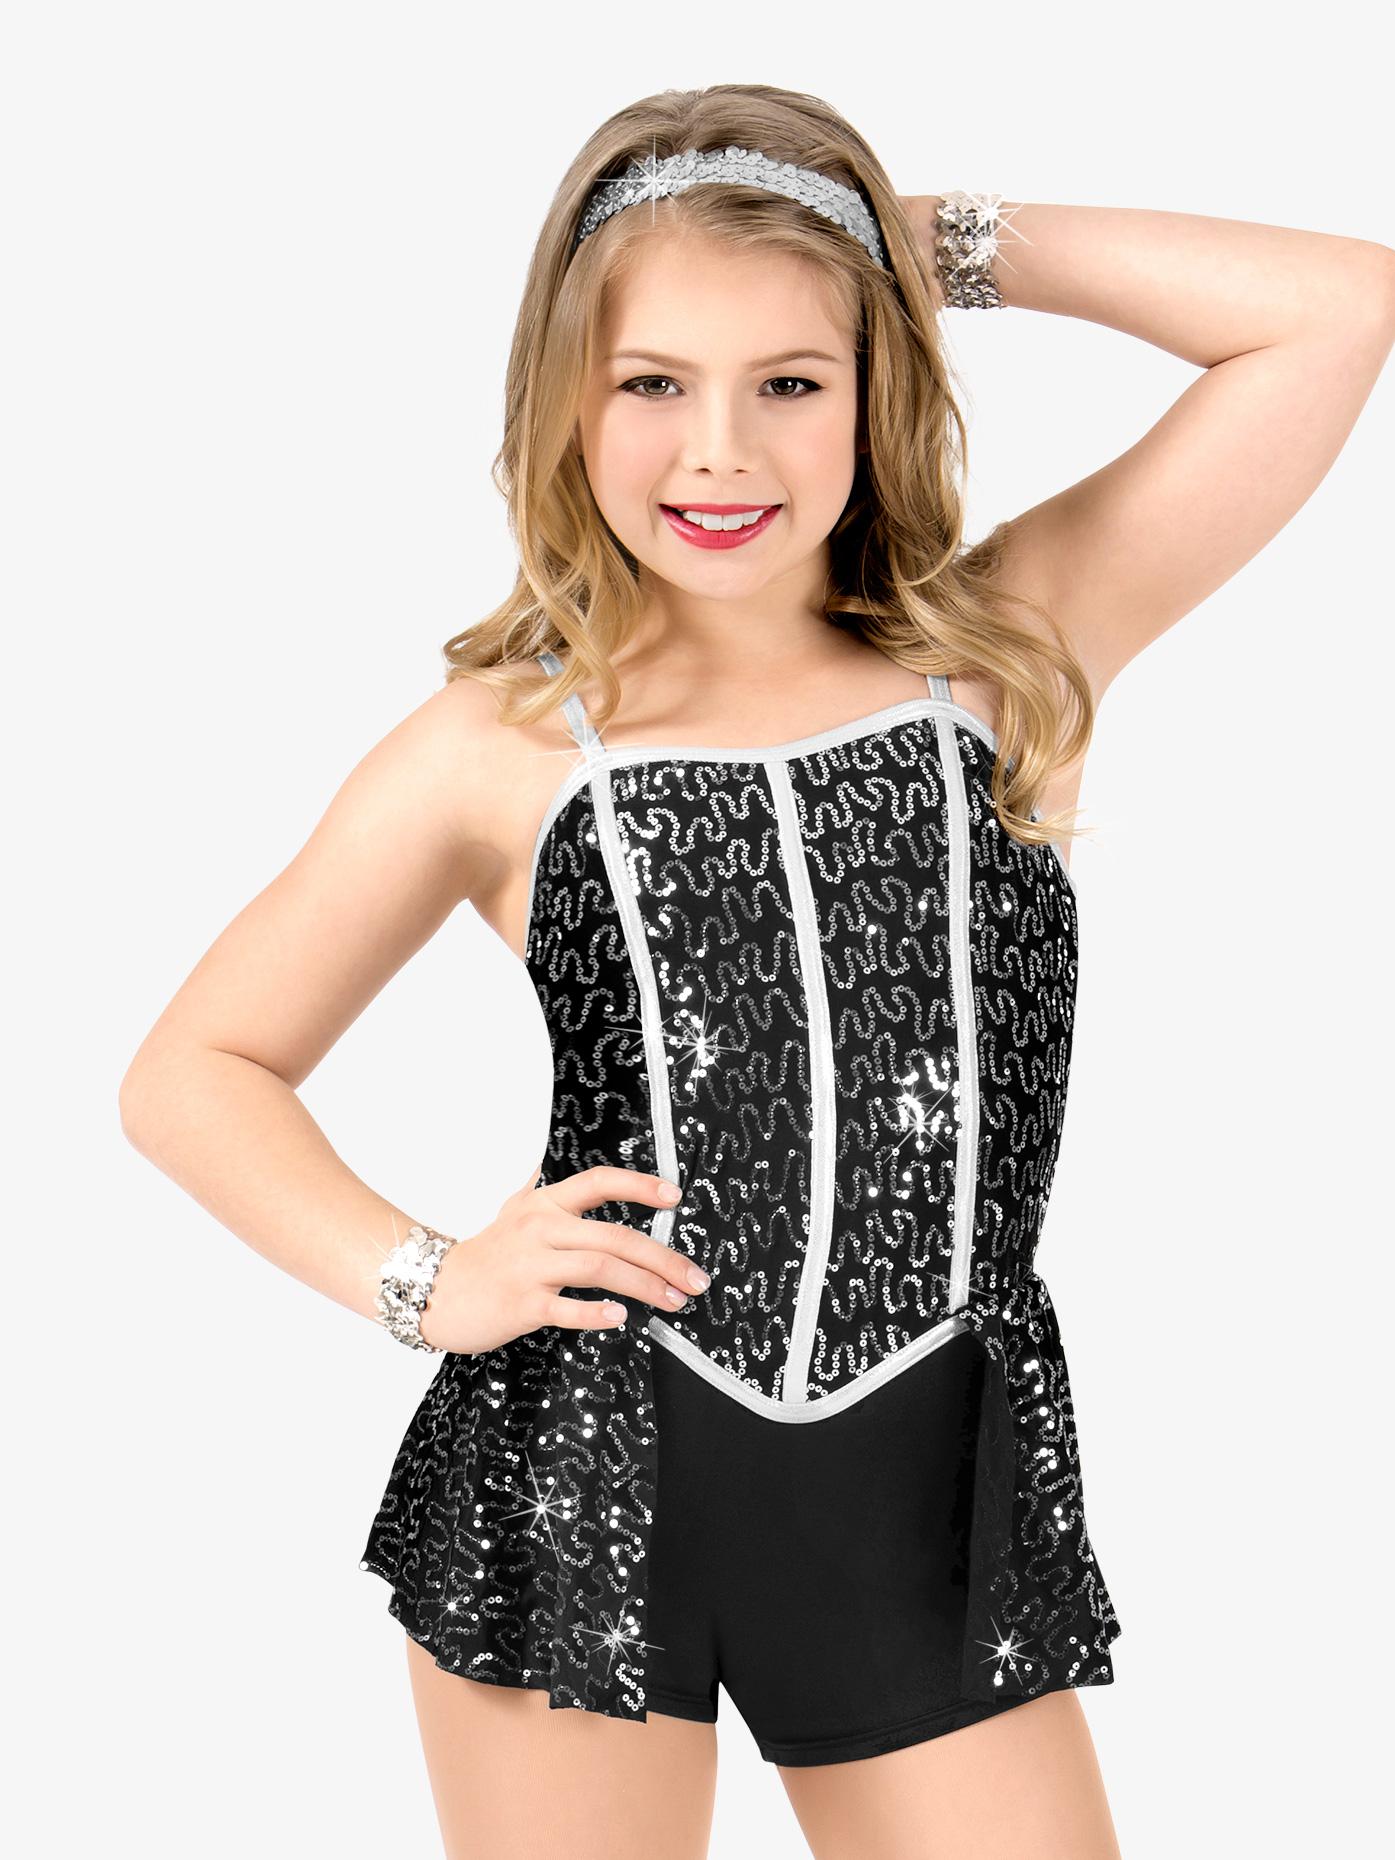 Elisse by Double Platinum Girls Sequin Camisole Performance Shorty Unitard N7499C